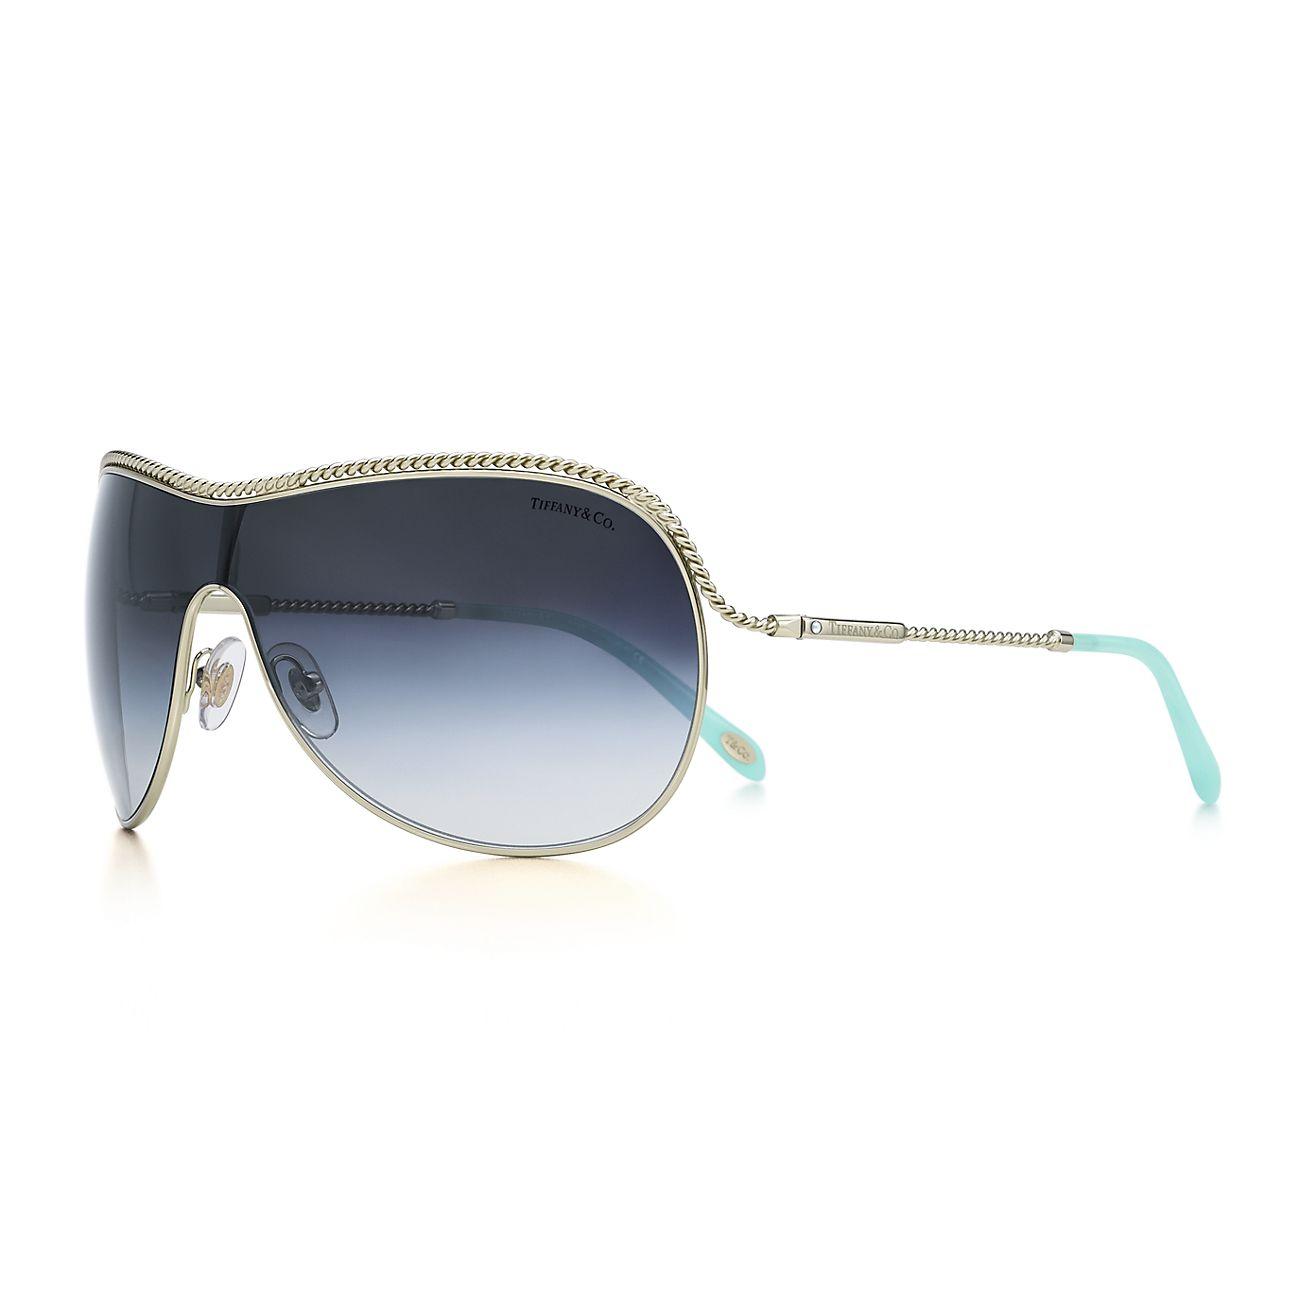 Tiffany Twist shield sunglasses in pale gold-colored metal ...